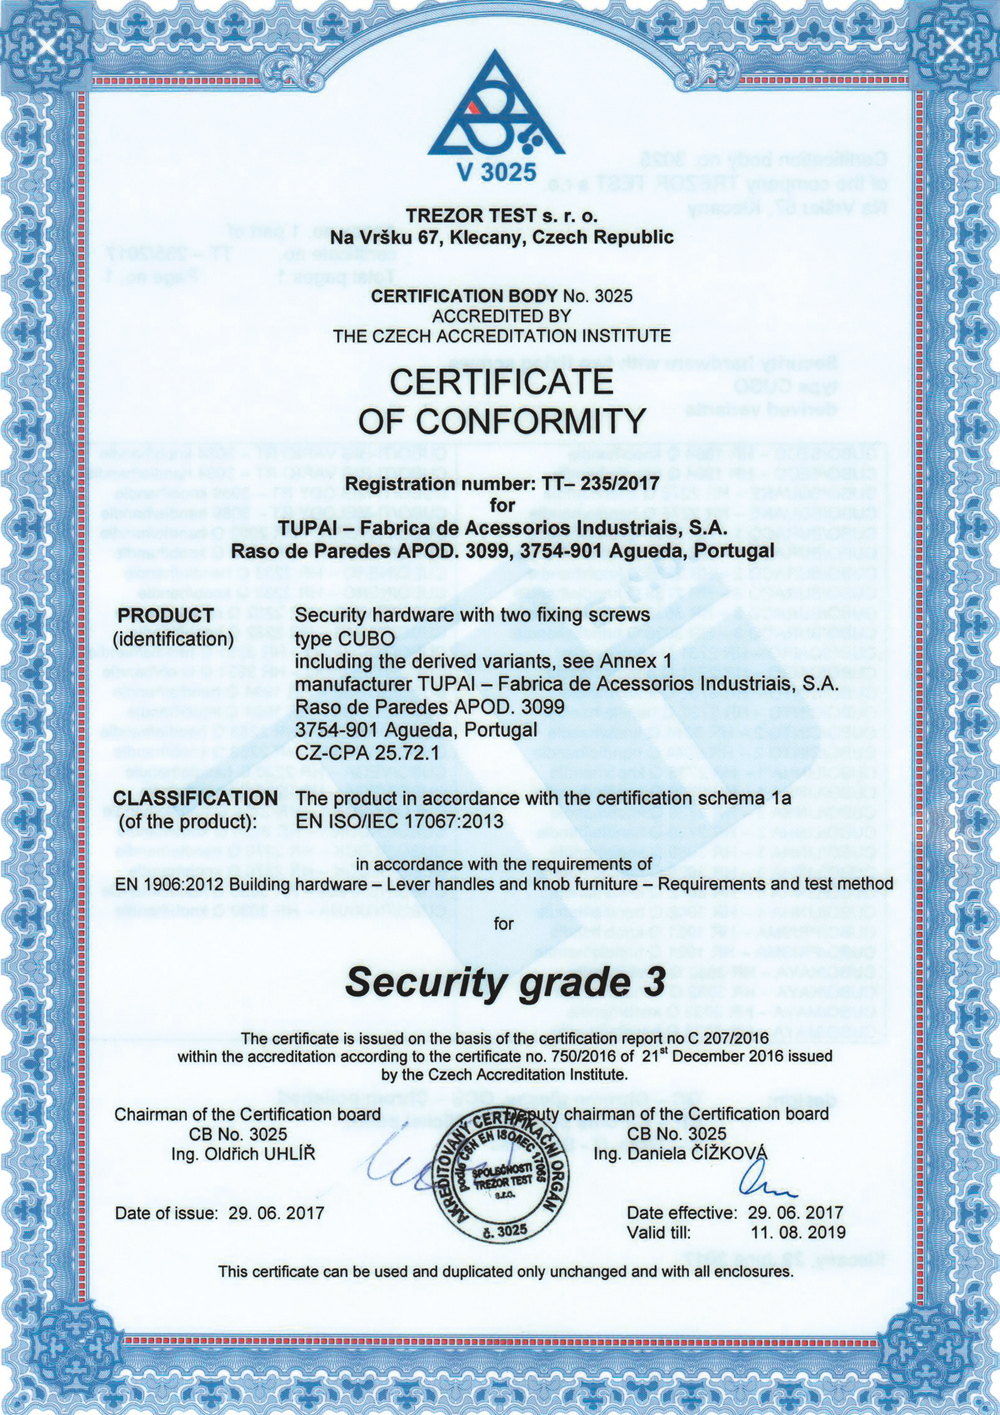 certificate-conformity-resistance-class-3